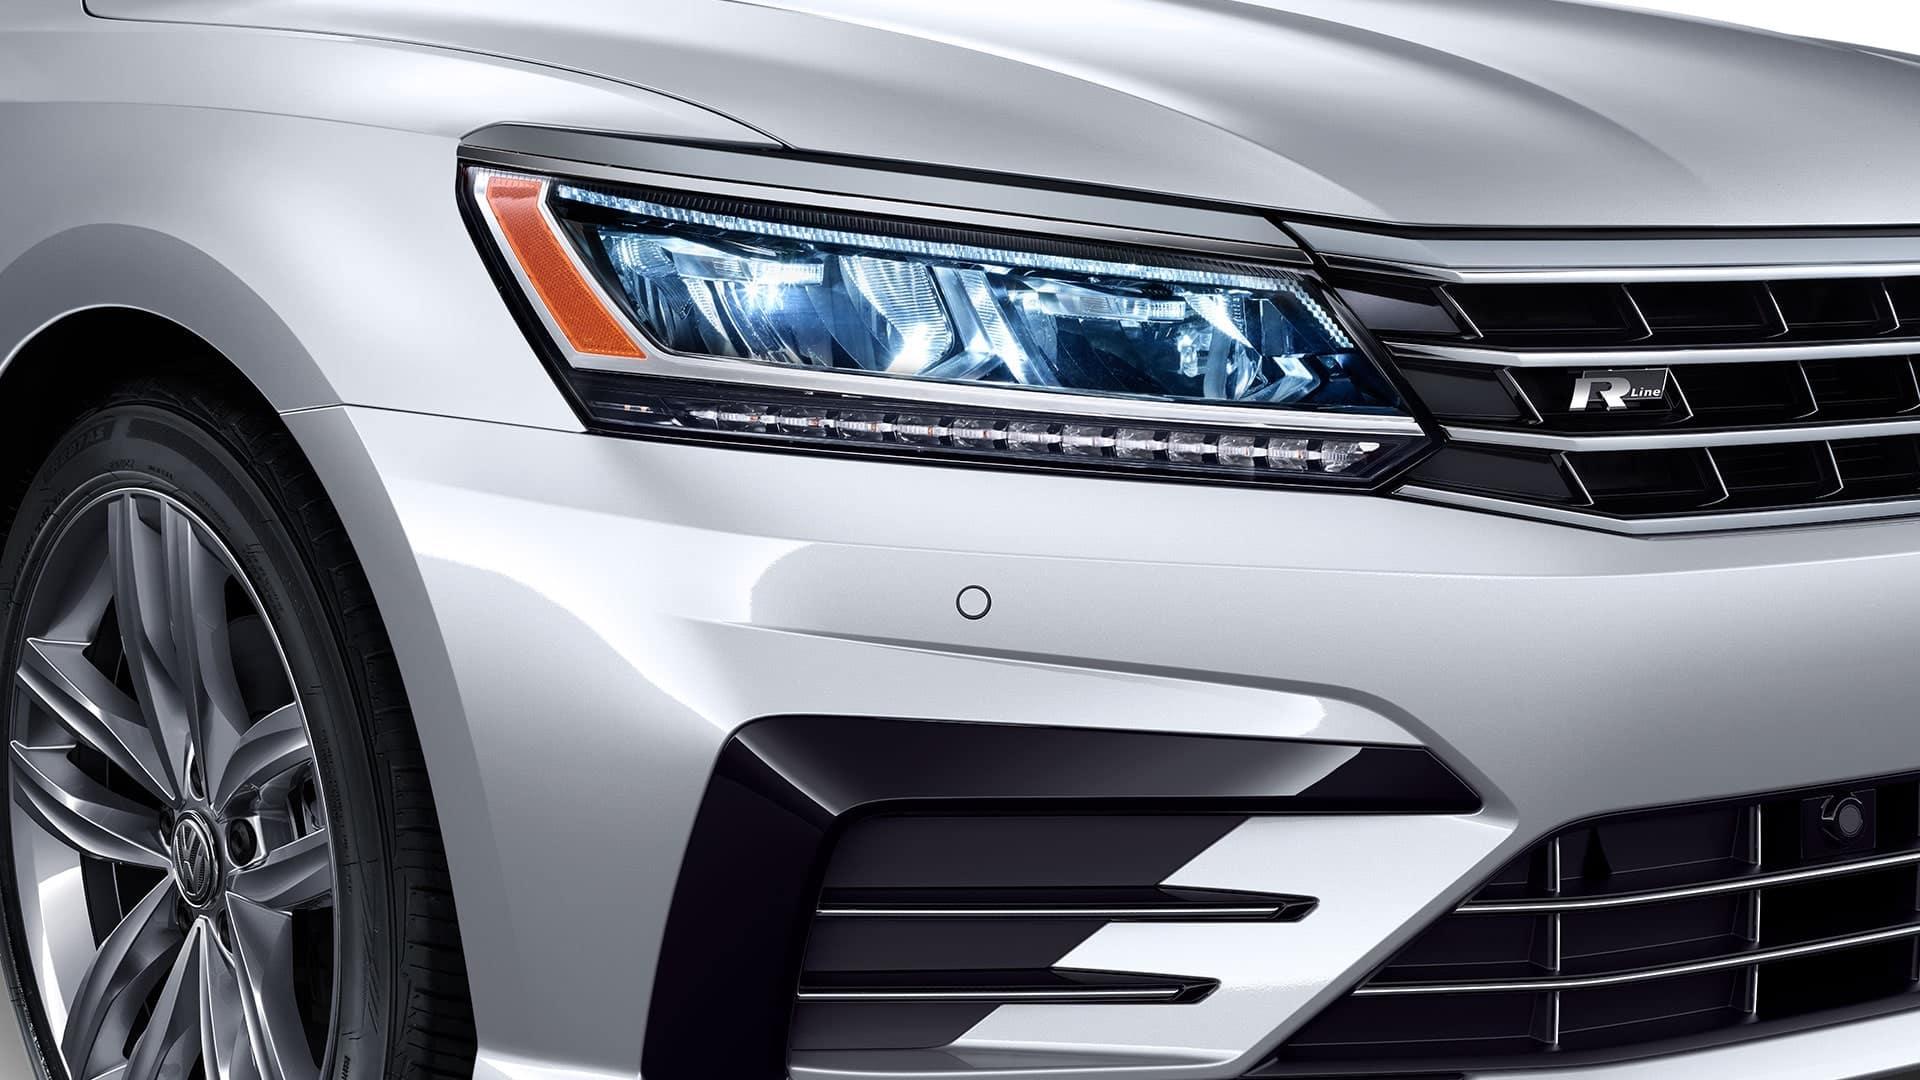 2019 VW Passat LED lights